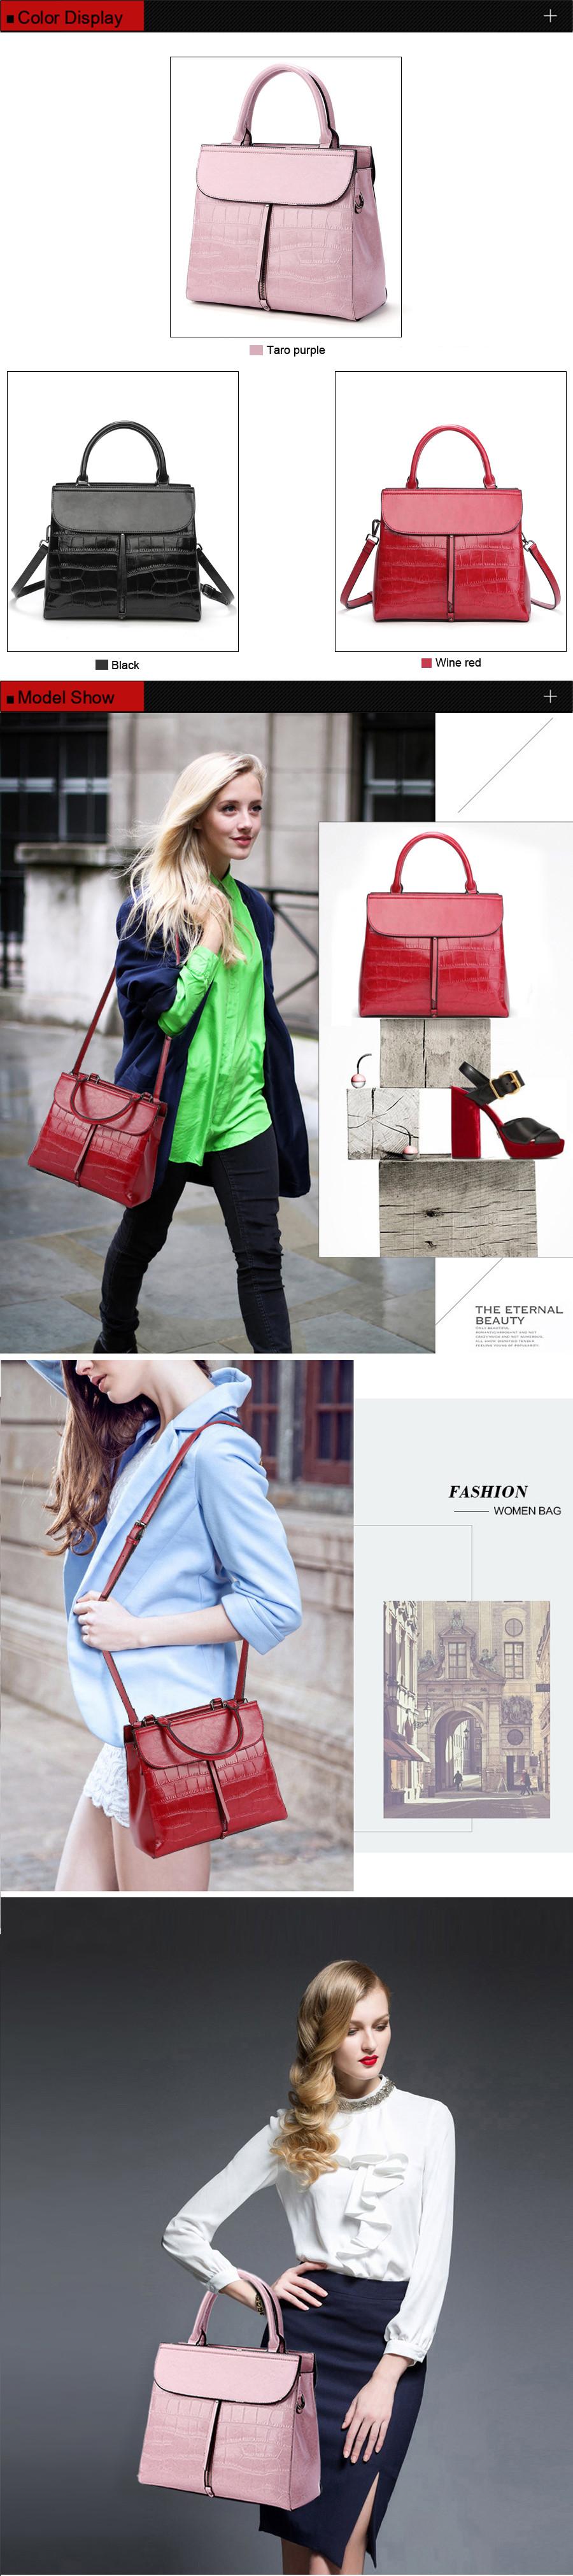 900woman-handbag2